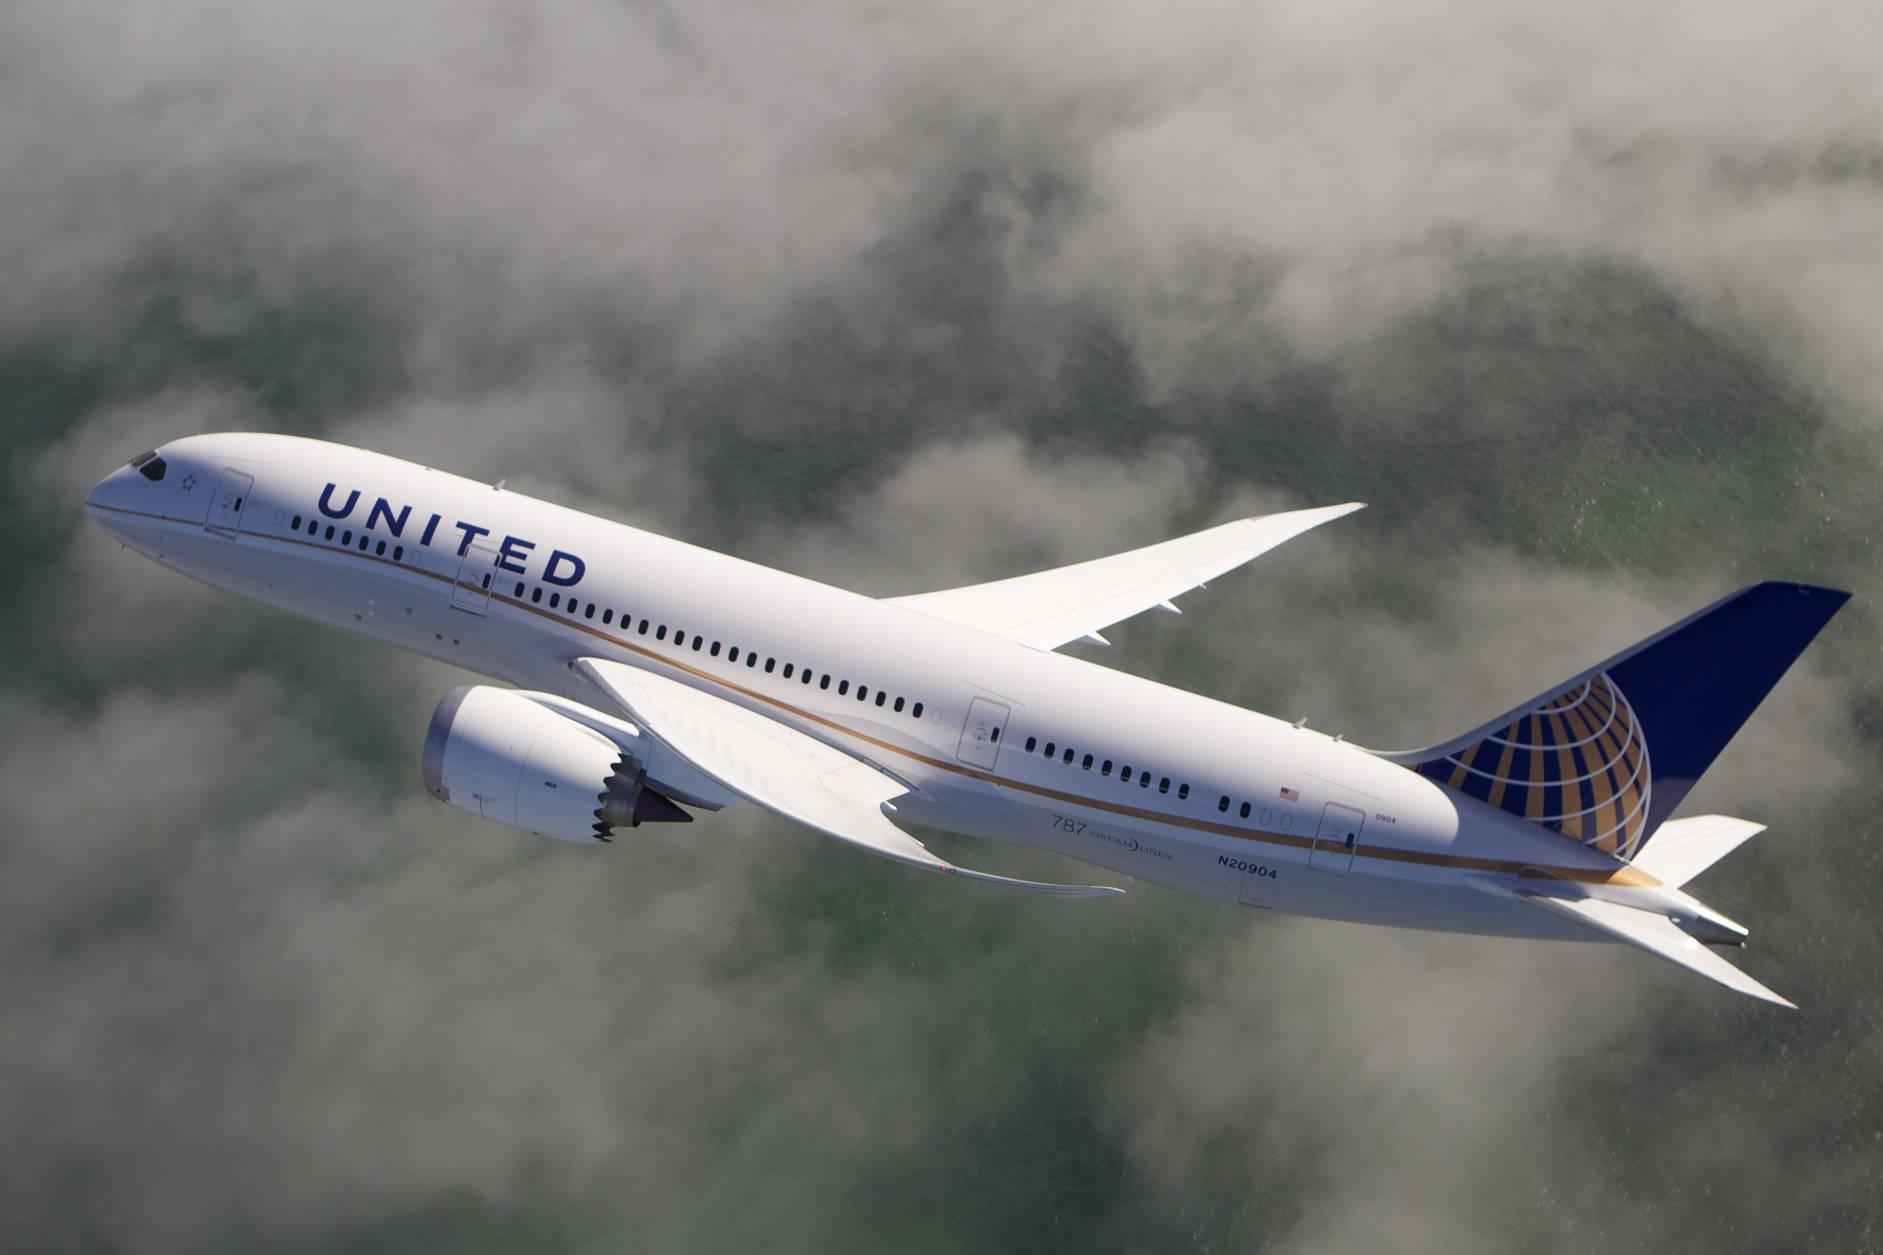 c71fb33093f727d36eaa_United_787_Dreamliner_Clouds.jpg